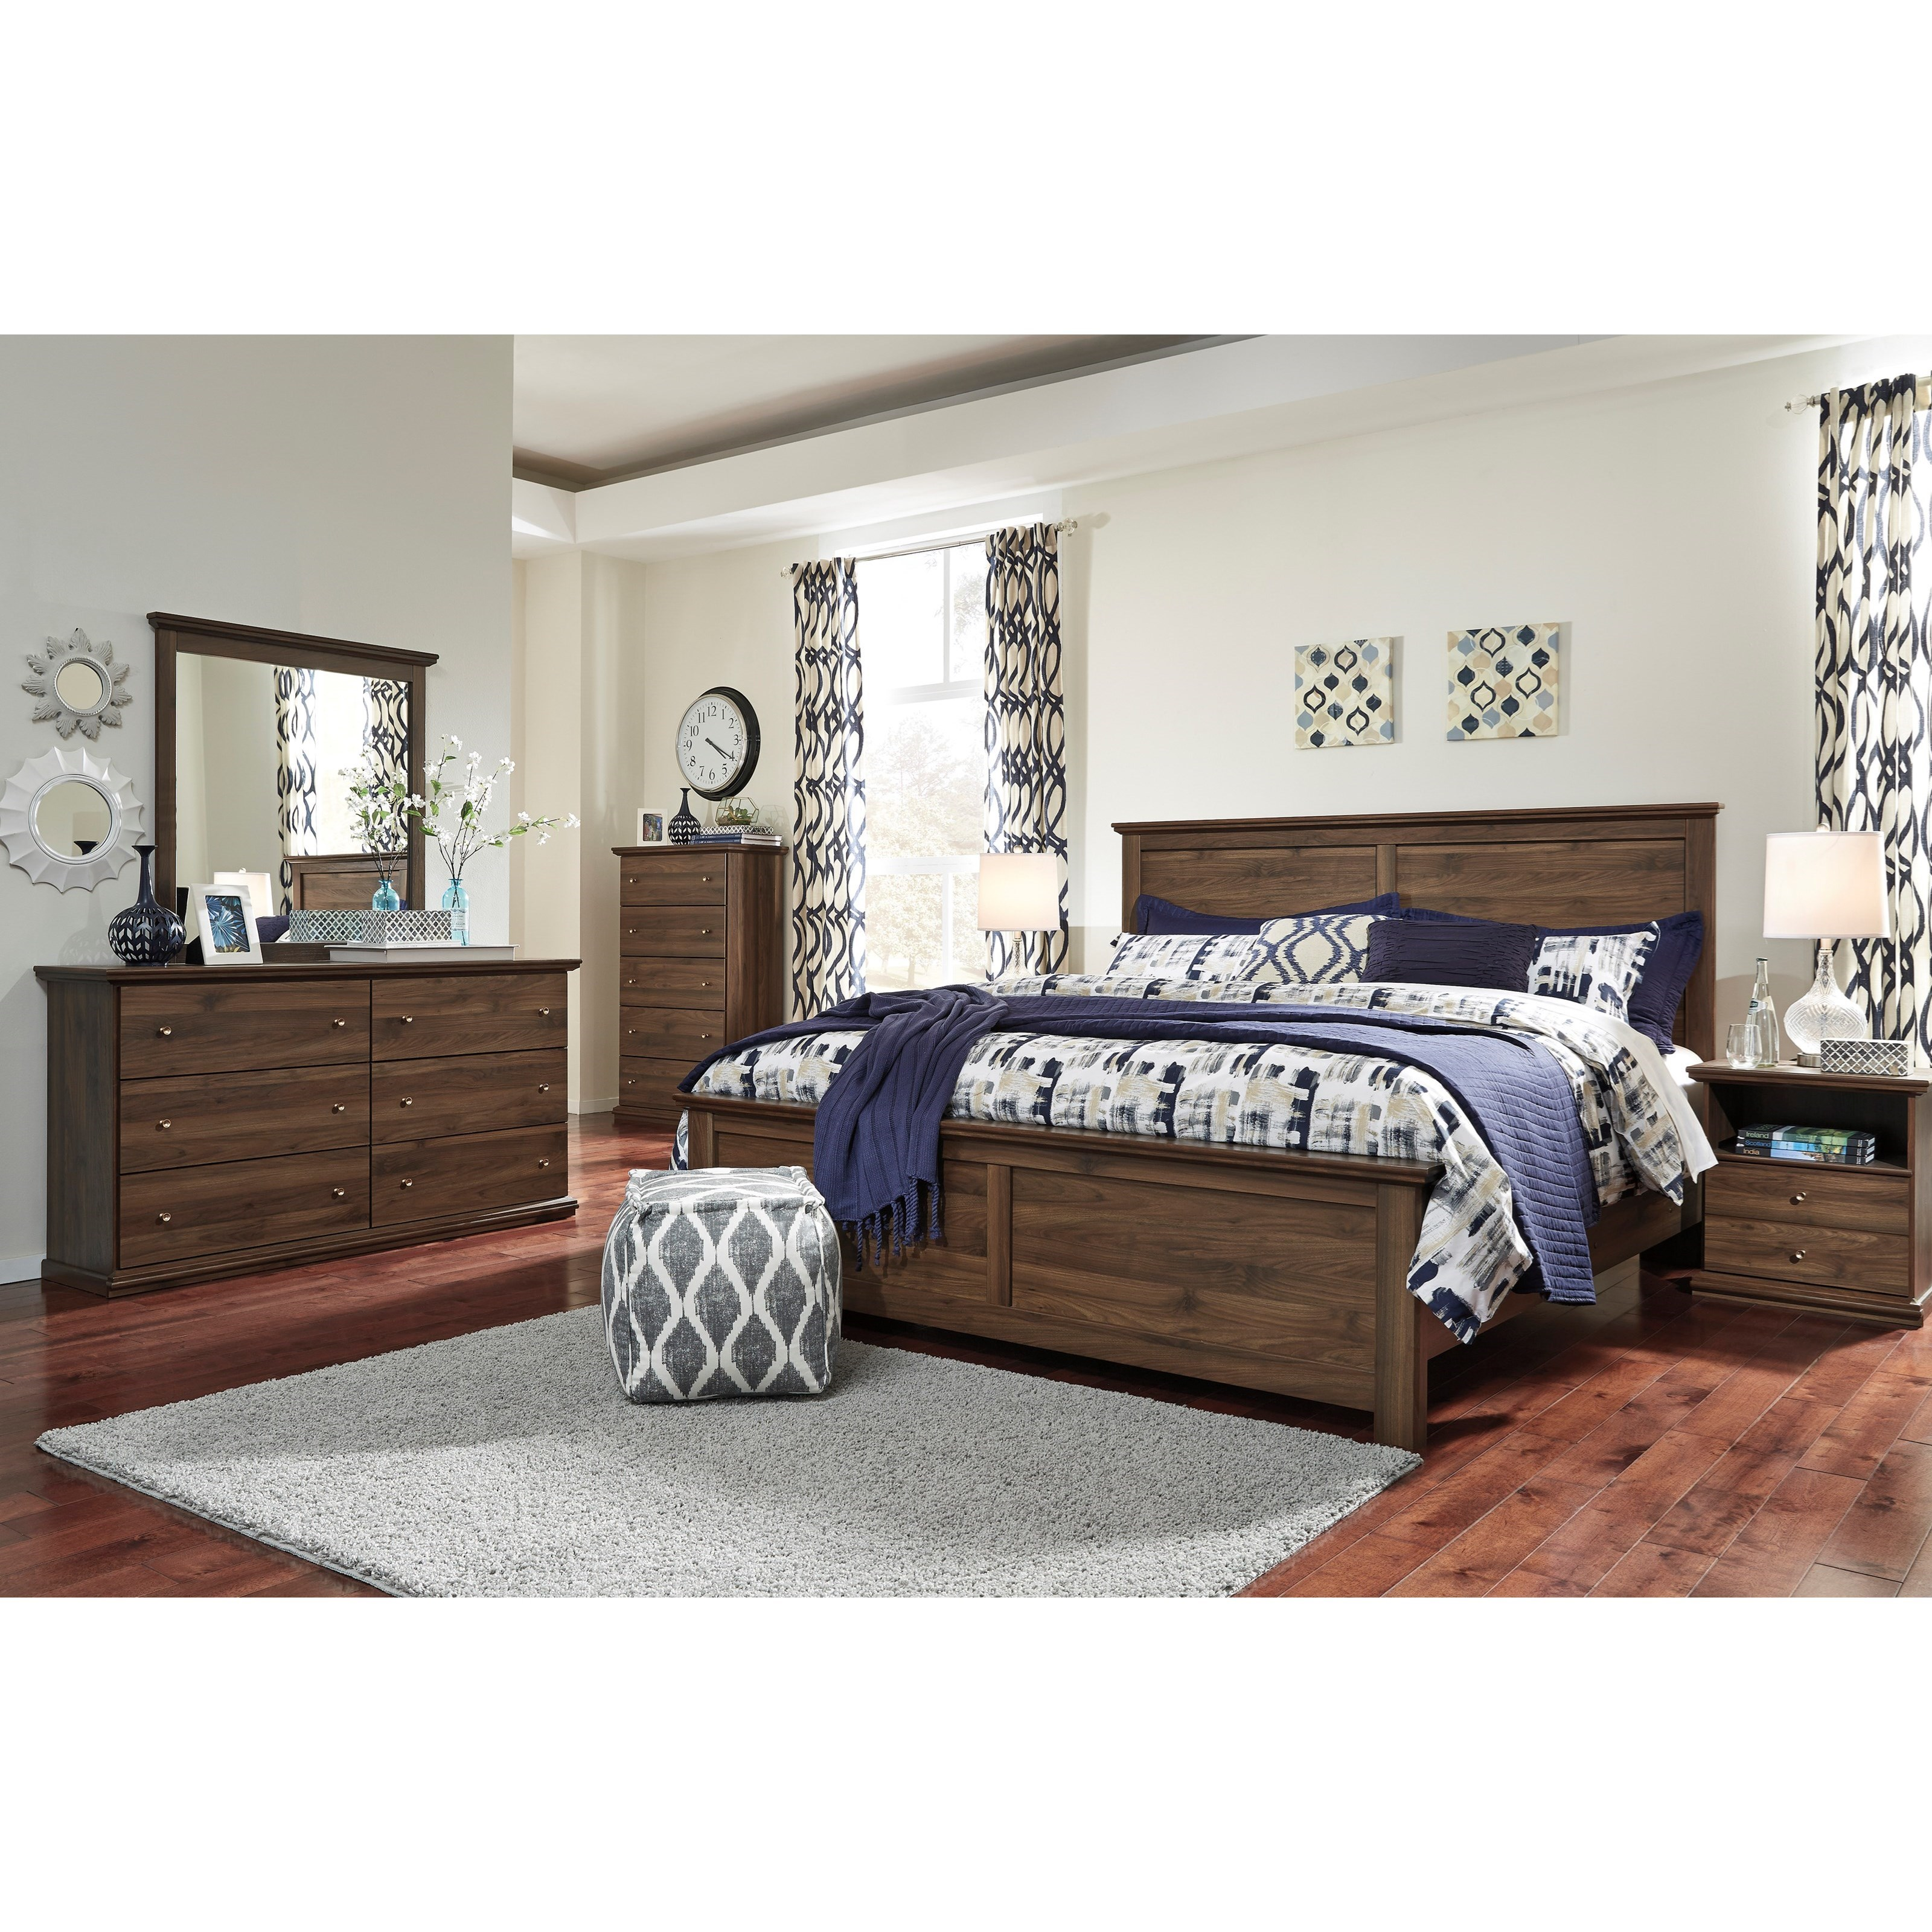 Signature Design by Ashley Burminson King Bedroom Group - Item Number: B135 K Bedroom Group 1